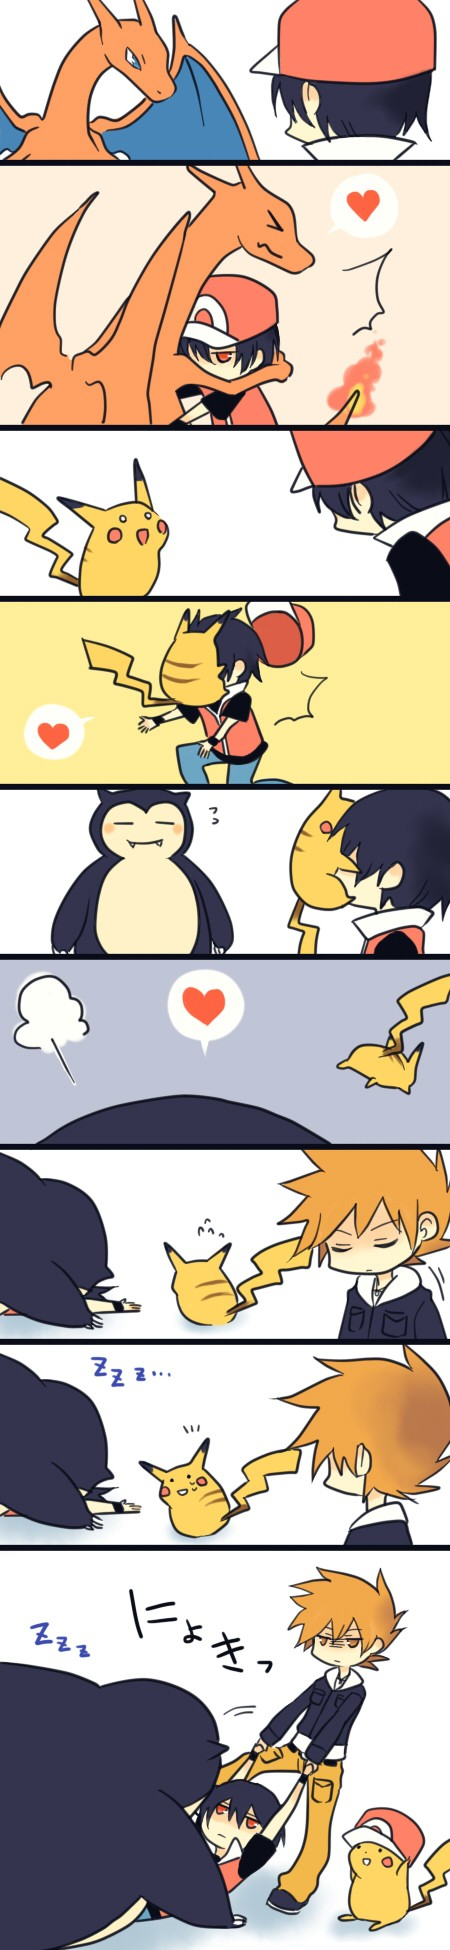 Amusing comic strips... Red_lo11